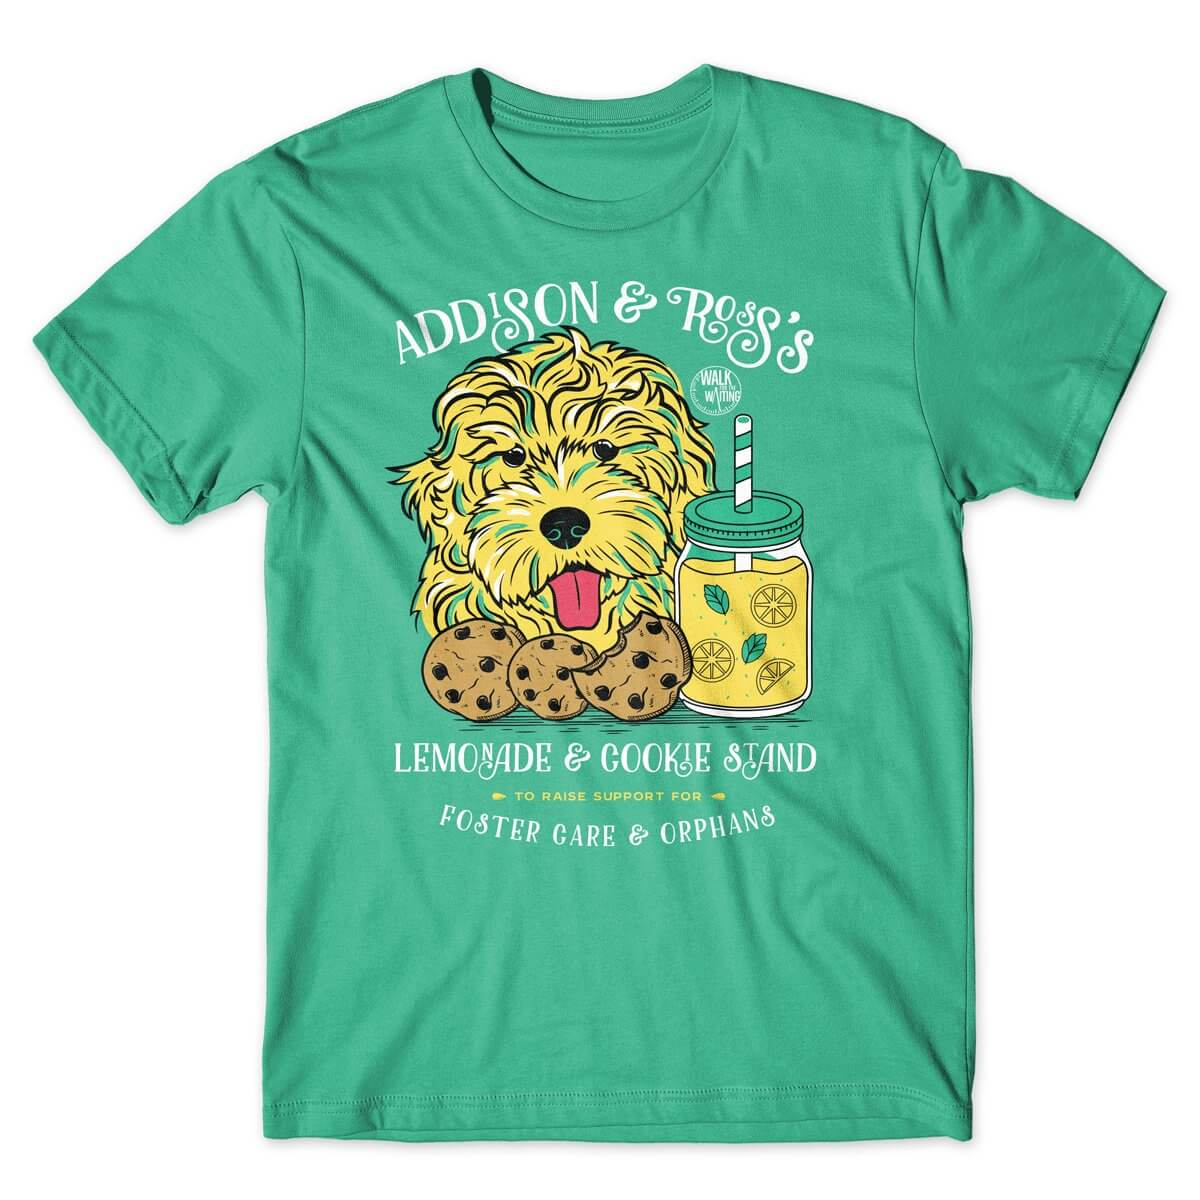 Walk for the Waiting Lemonade Stand t-shirt